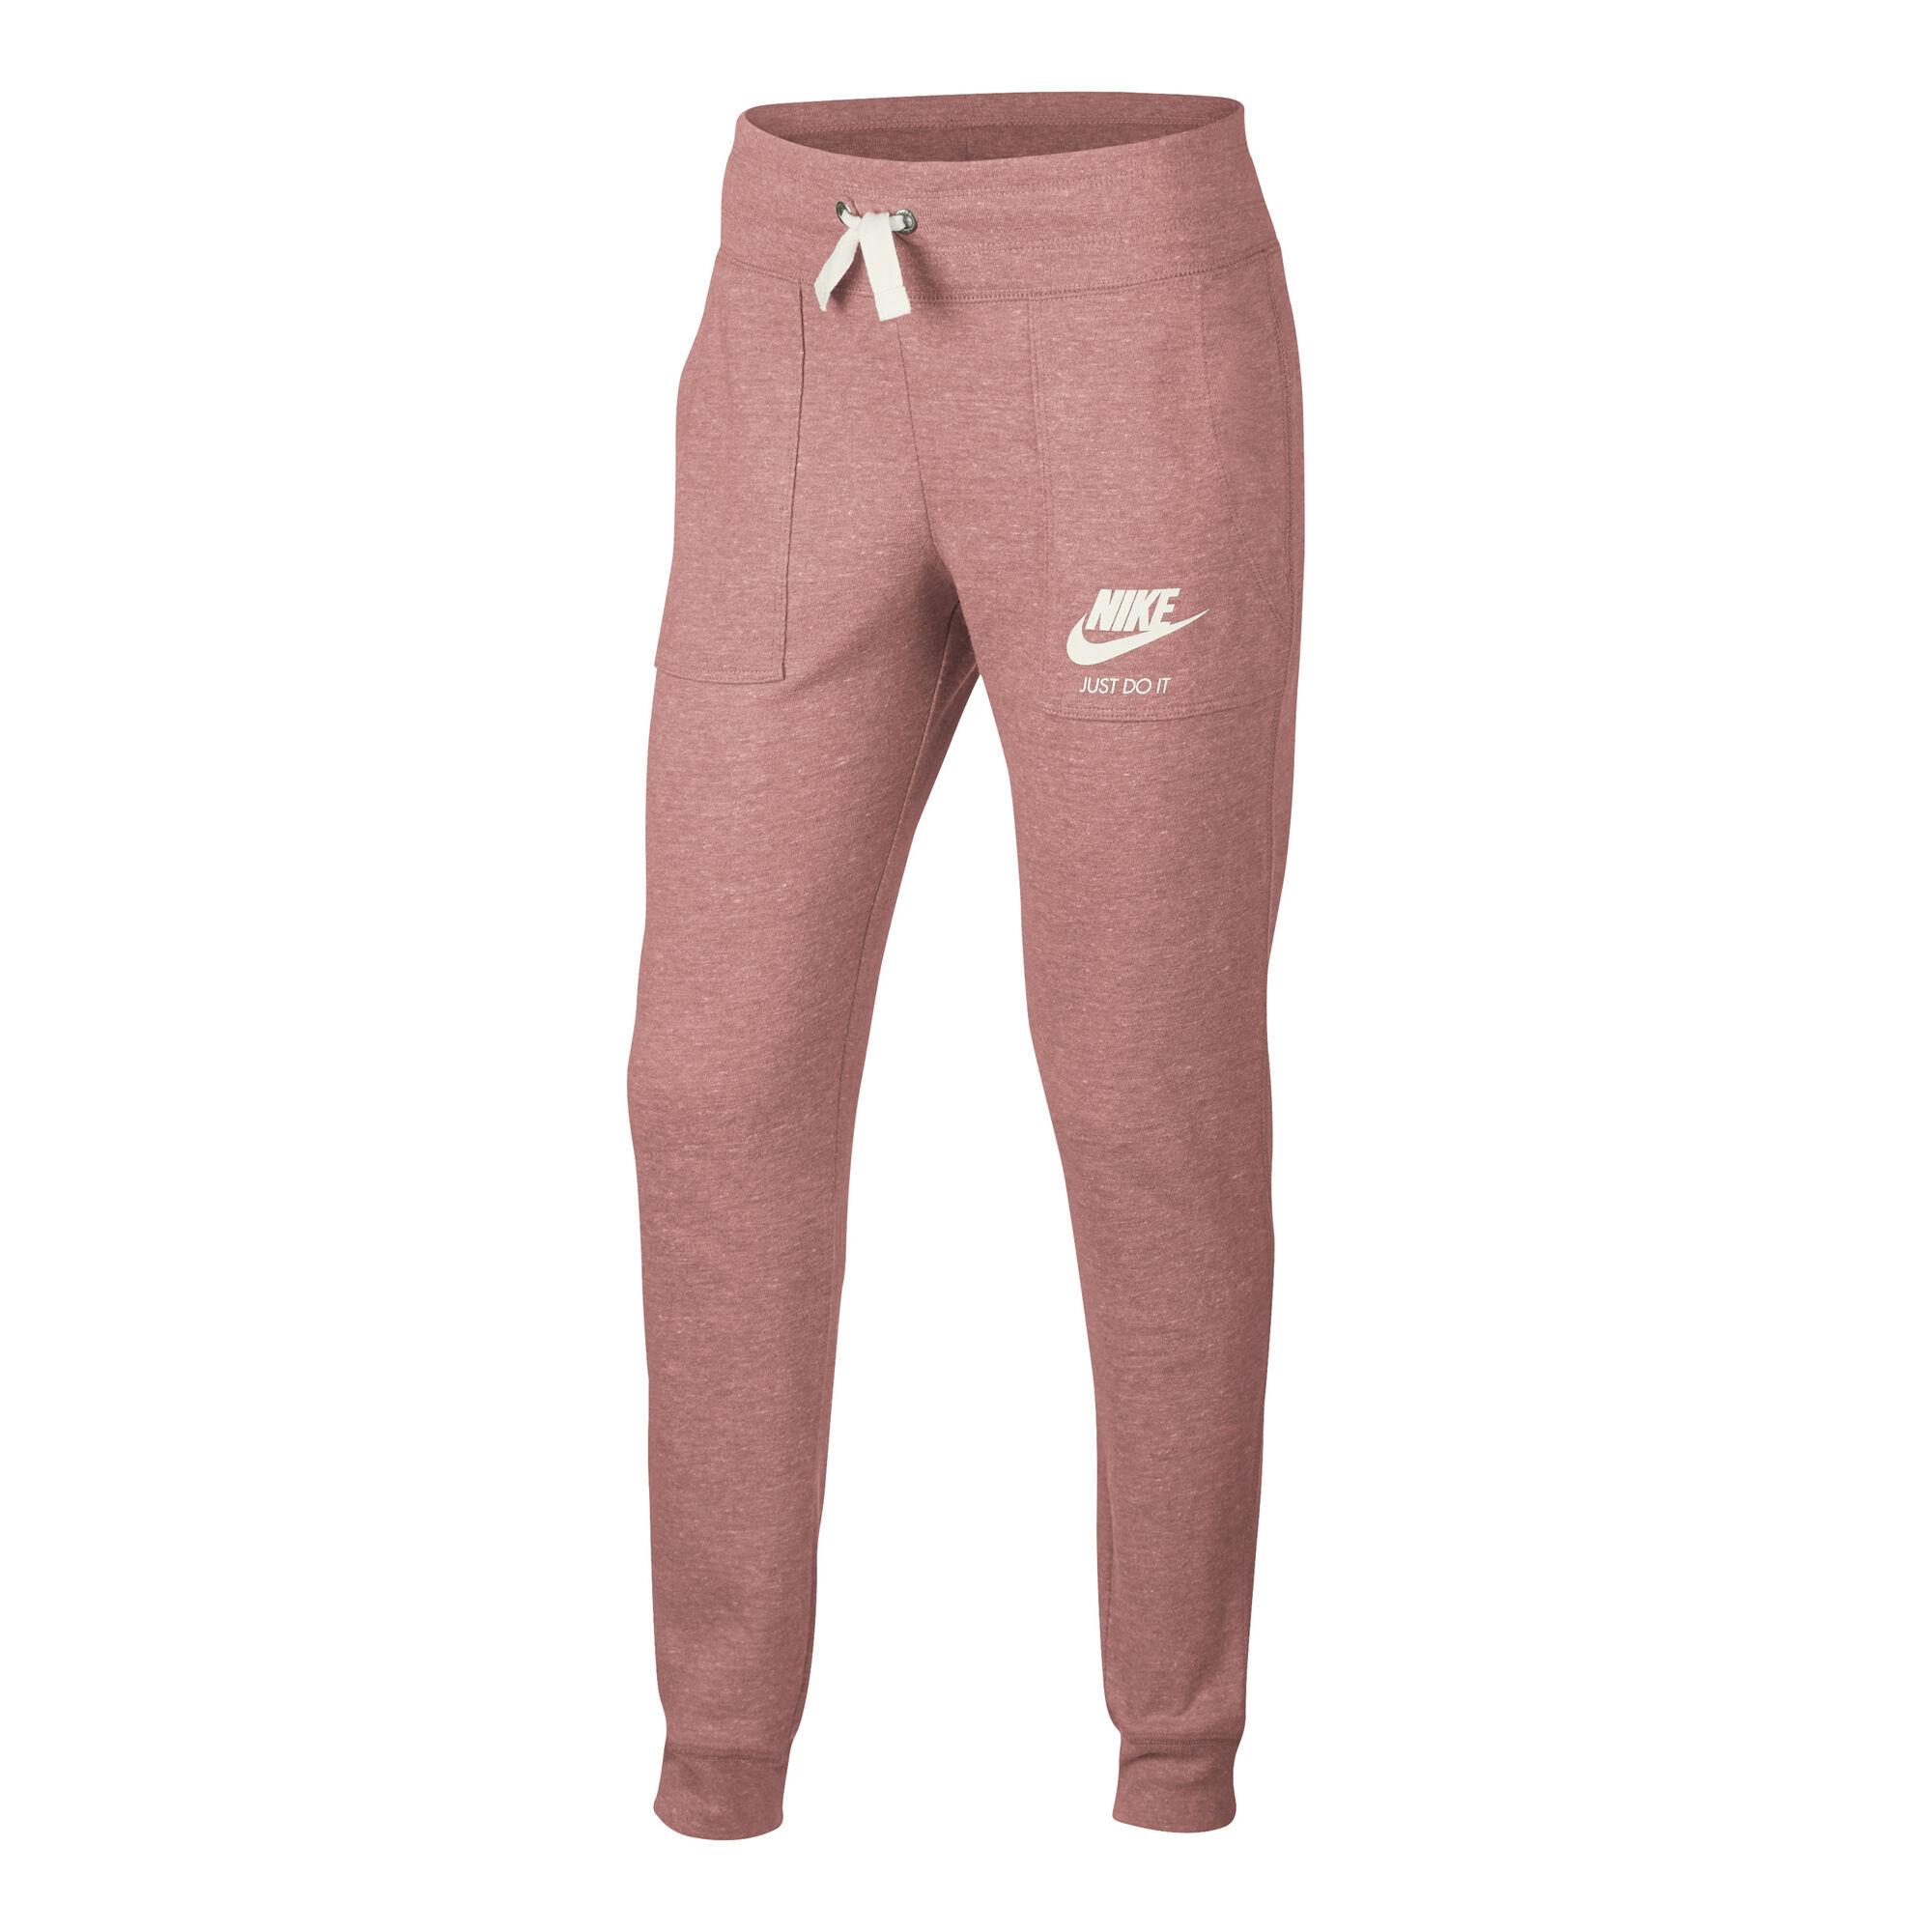 buy Nike Sportswear Vintage Training Pants Girls - Pink 5d74ccd1d292f